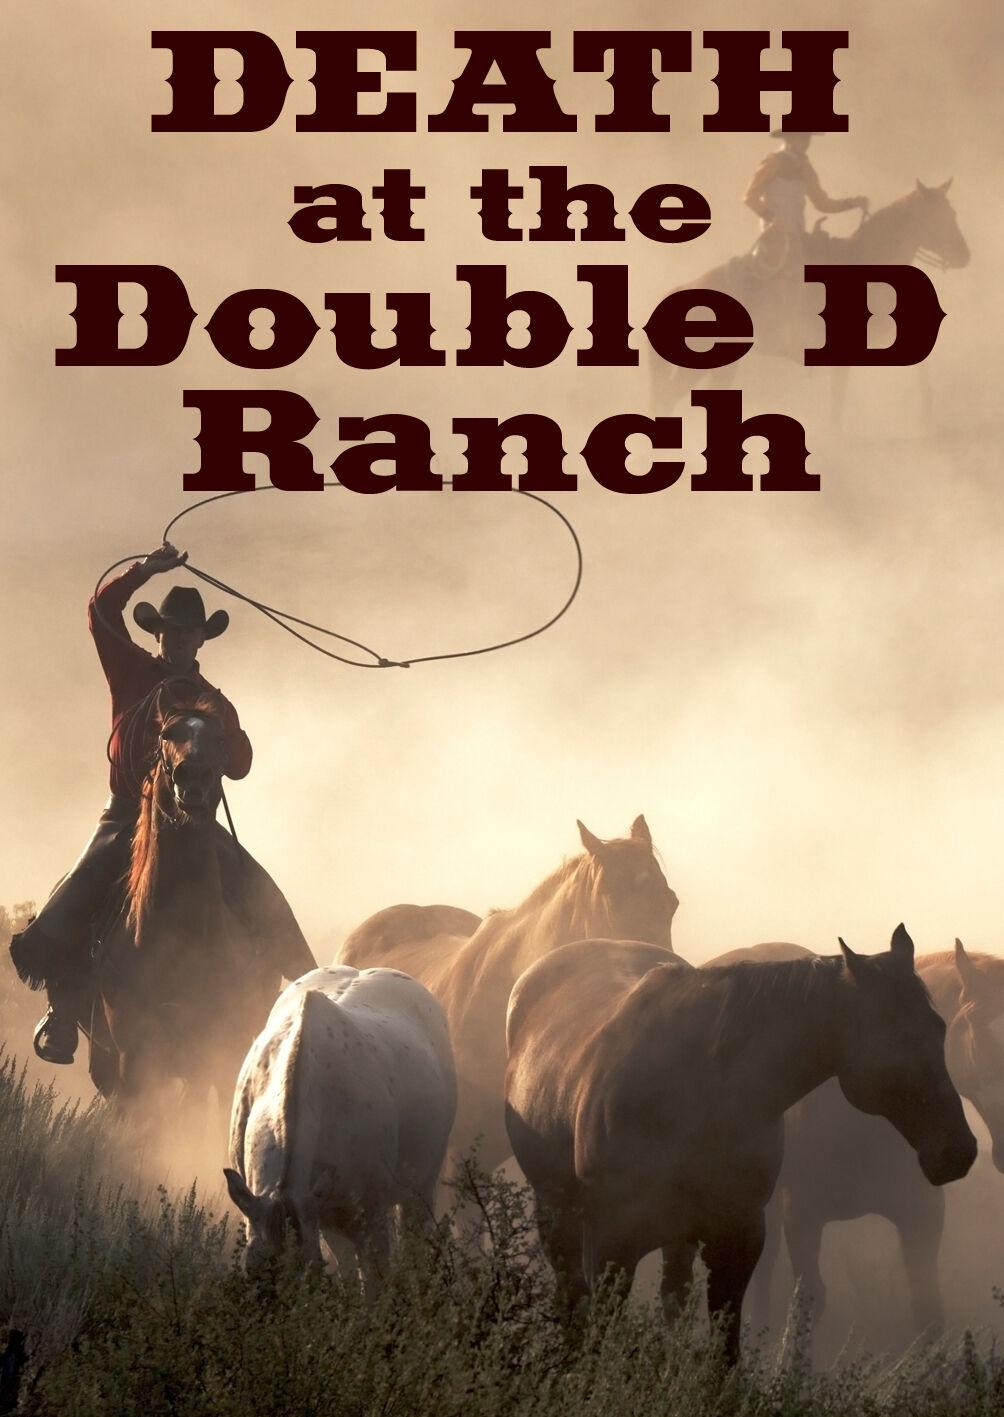 Morte A DOUBLE D Ranch - 6, 8, 10, 12 Player Games